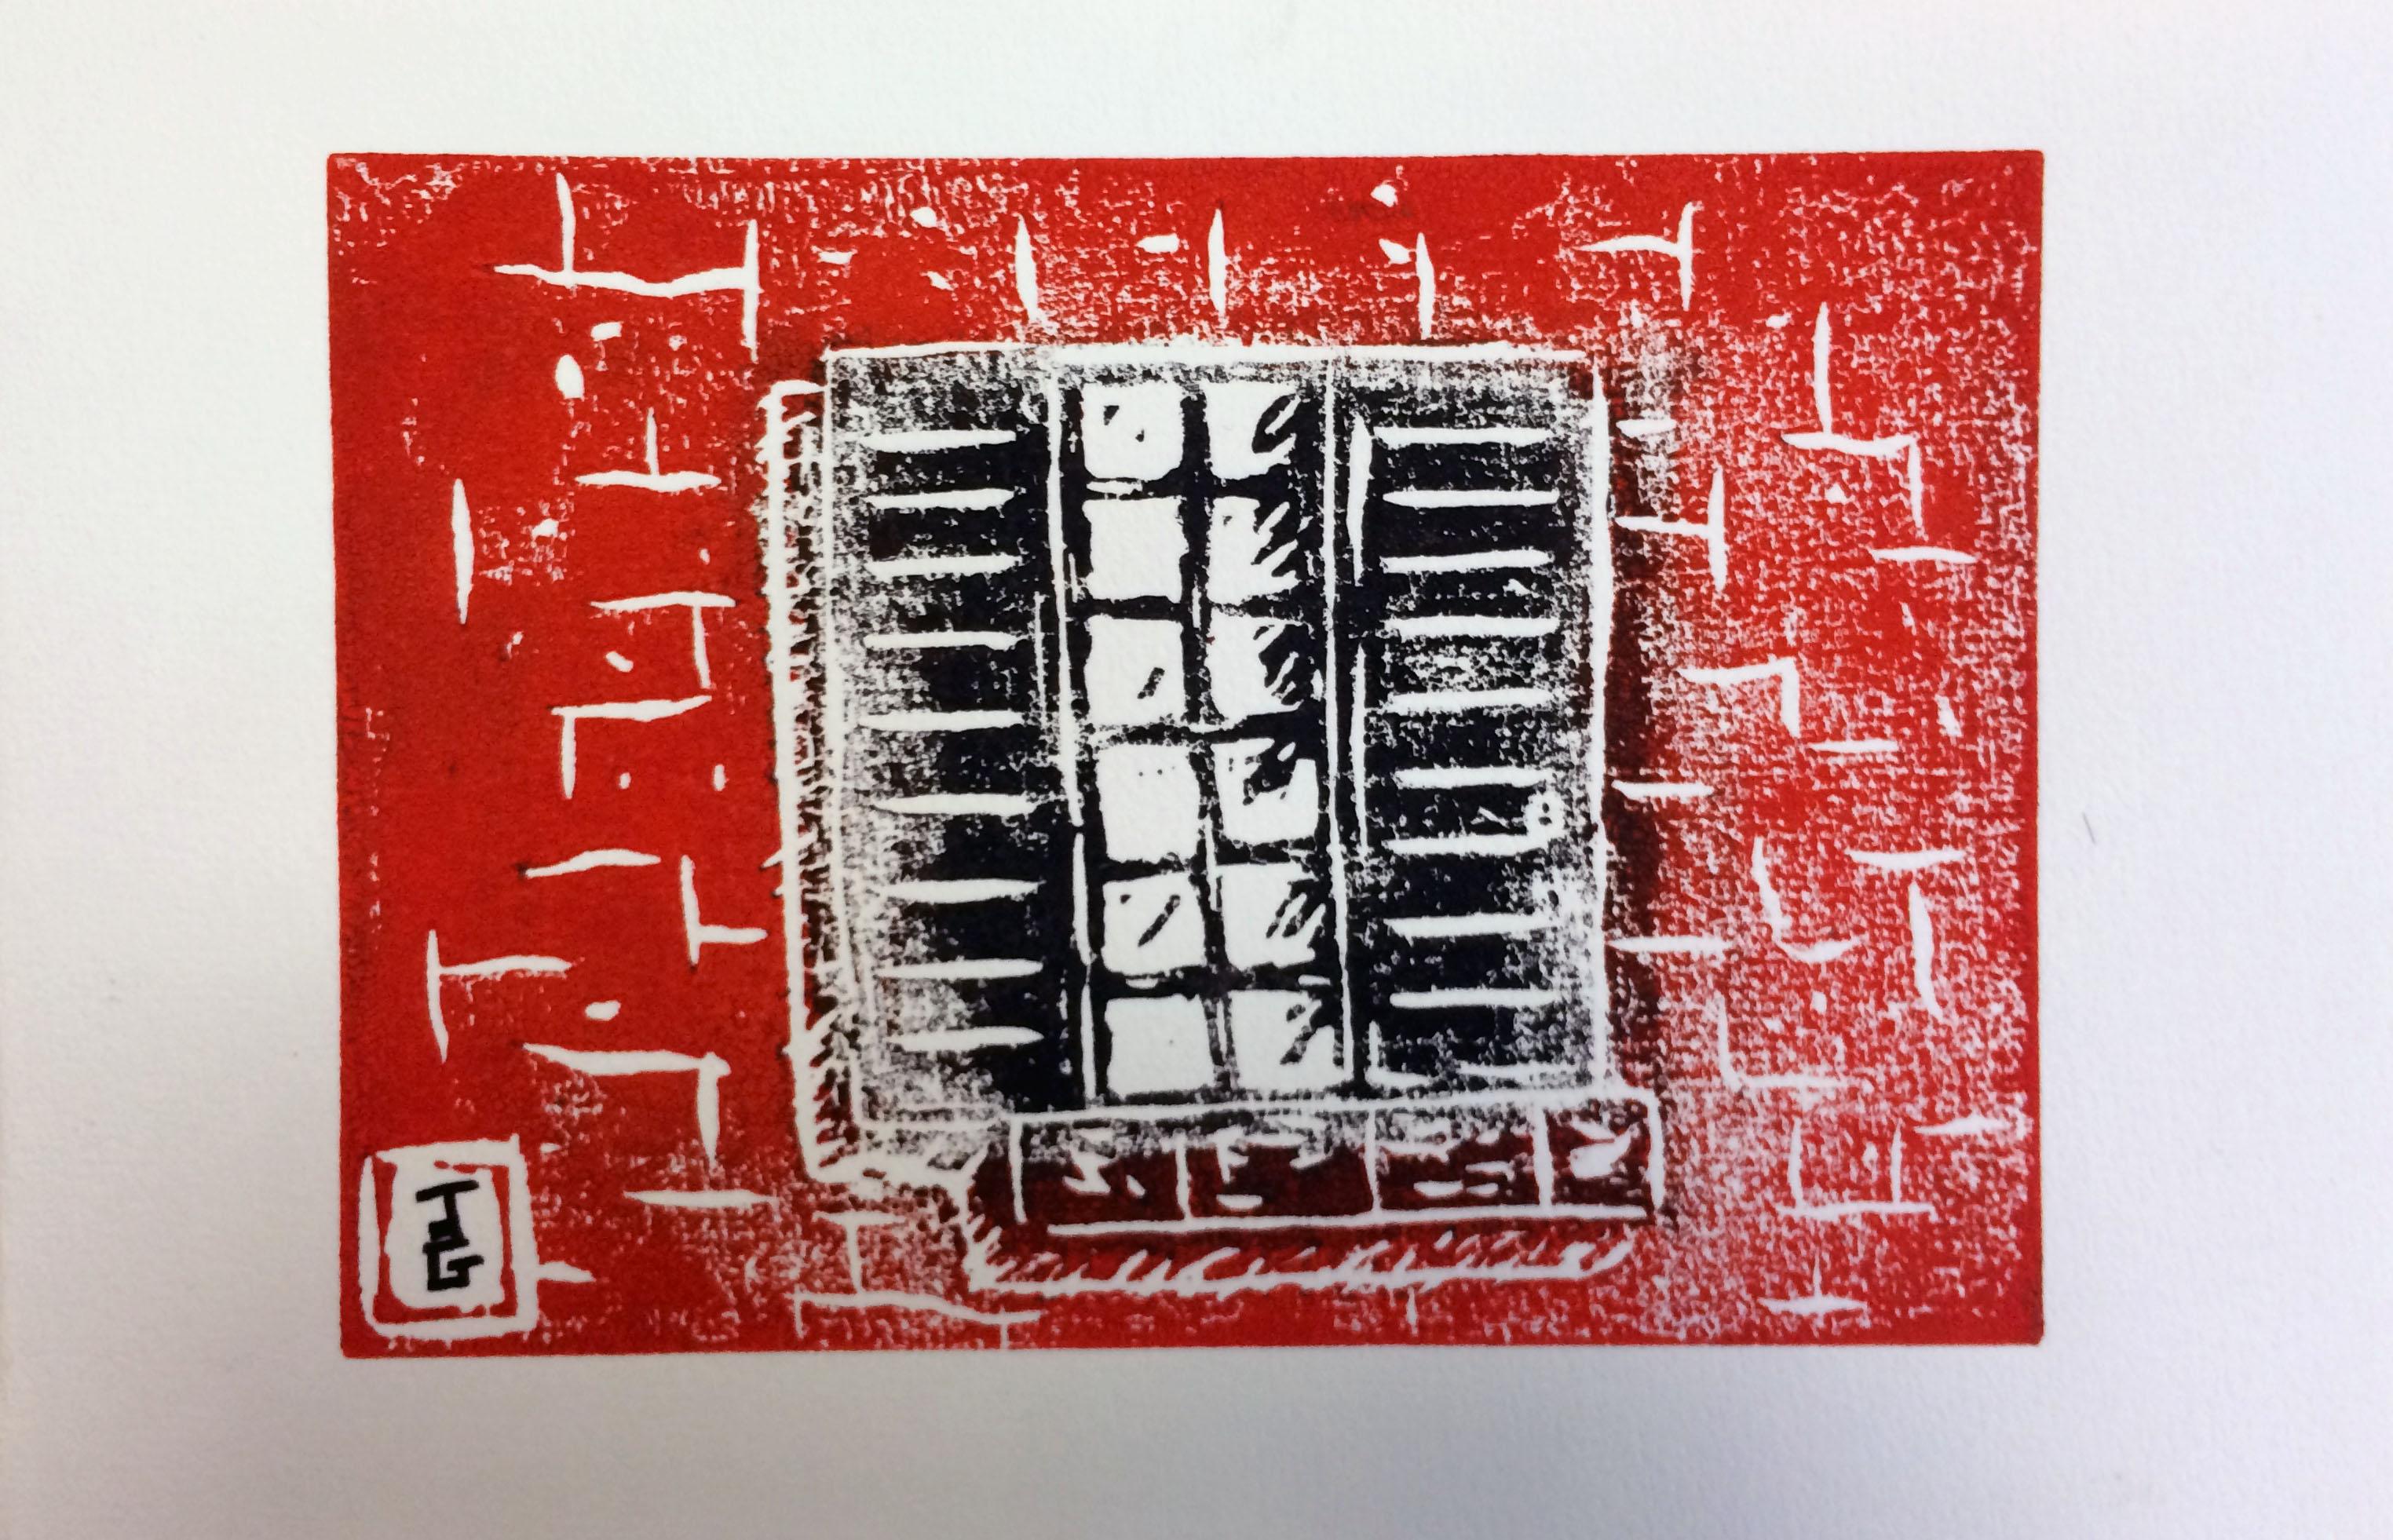 Persiennes - En rouge et noir